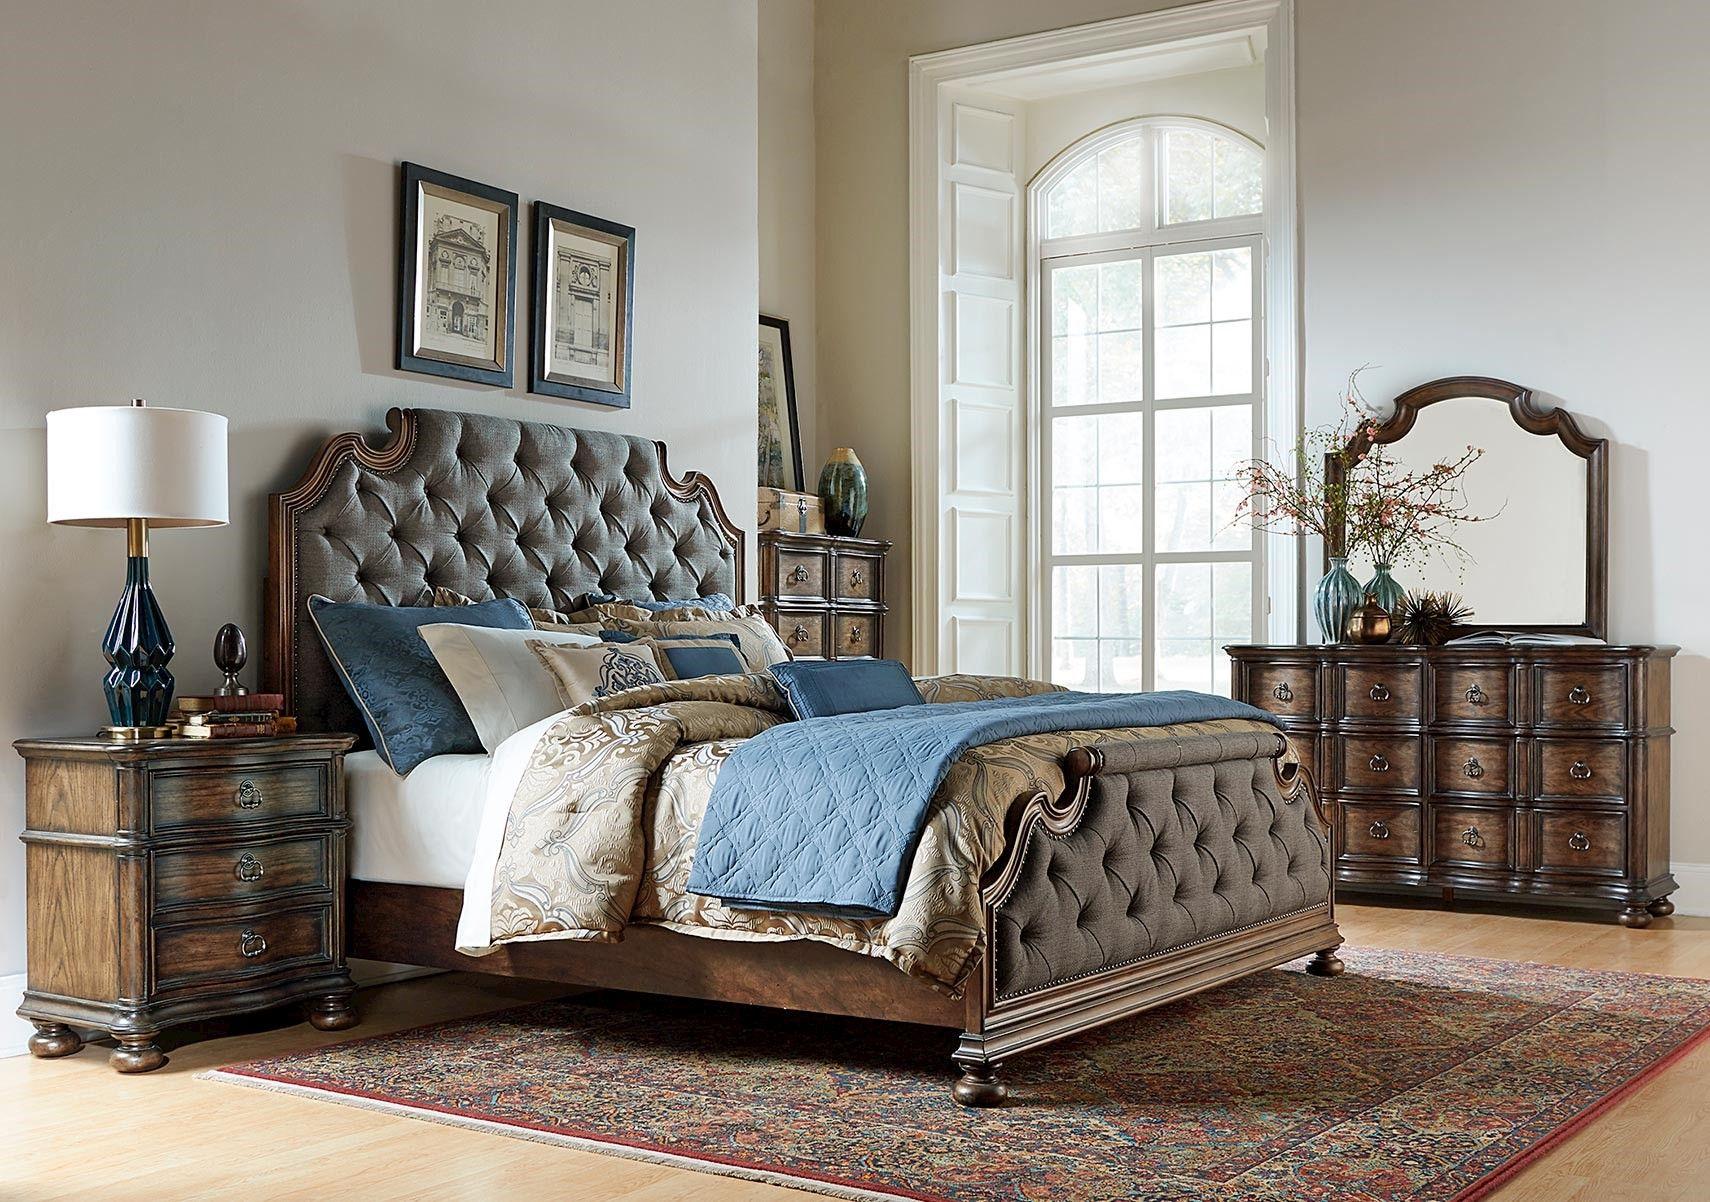 Awesome Lacks Bedroom Furniture Sets Gallery Home Design Ideas  # Muebles Lacks Mcallen